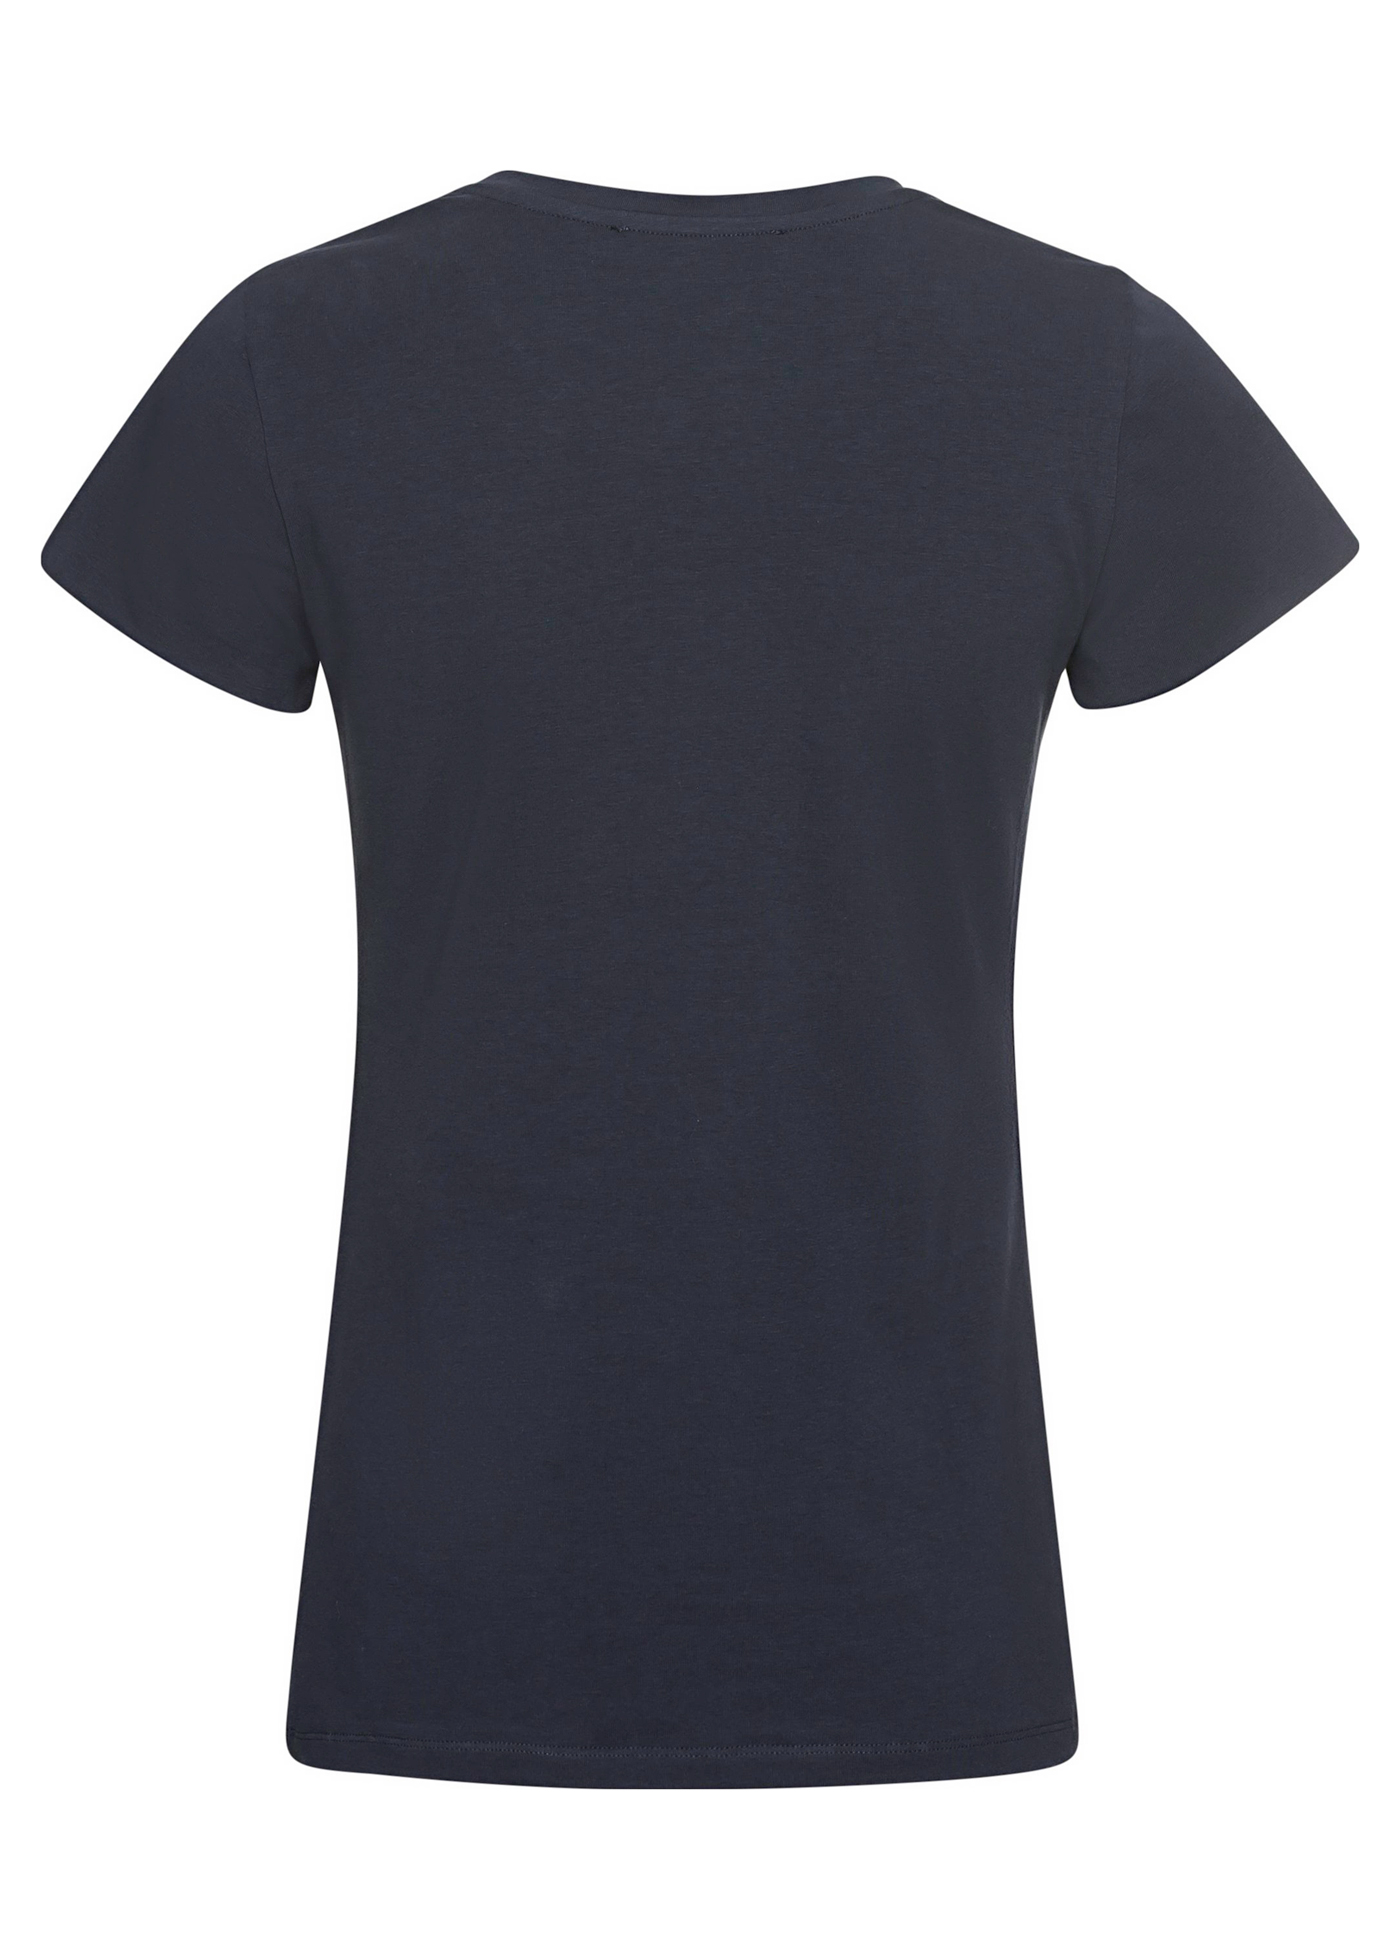 ALL TIME FAVORITES shirt image number 0